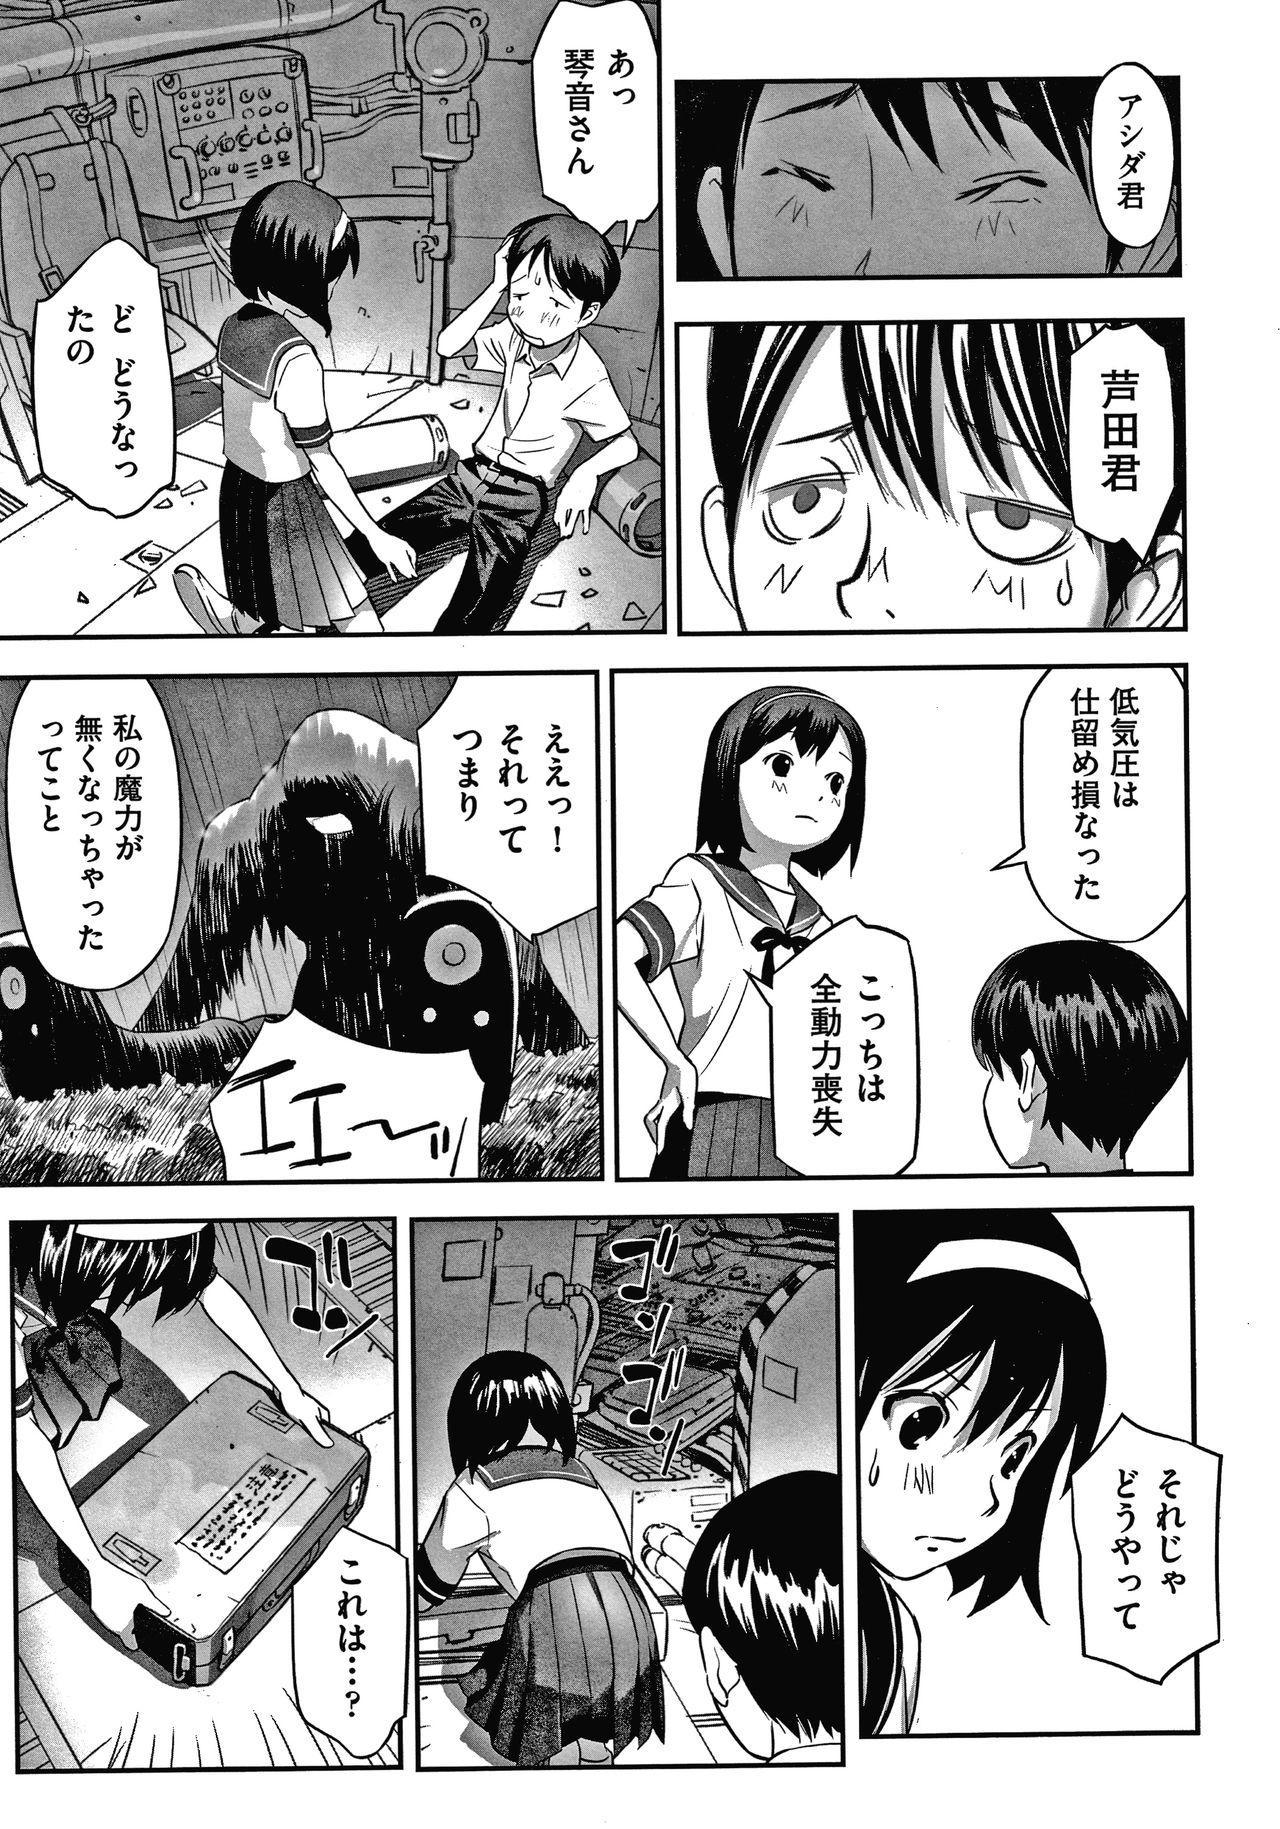 Shoujo Kumikyoku 15 105